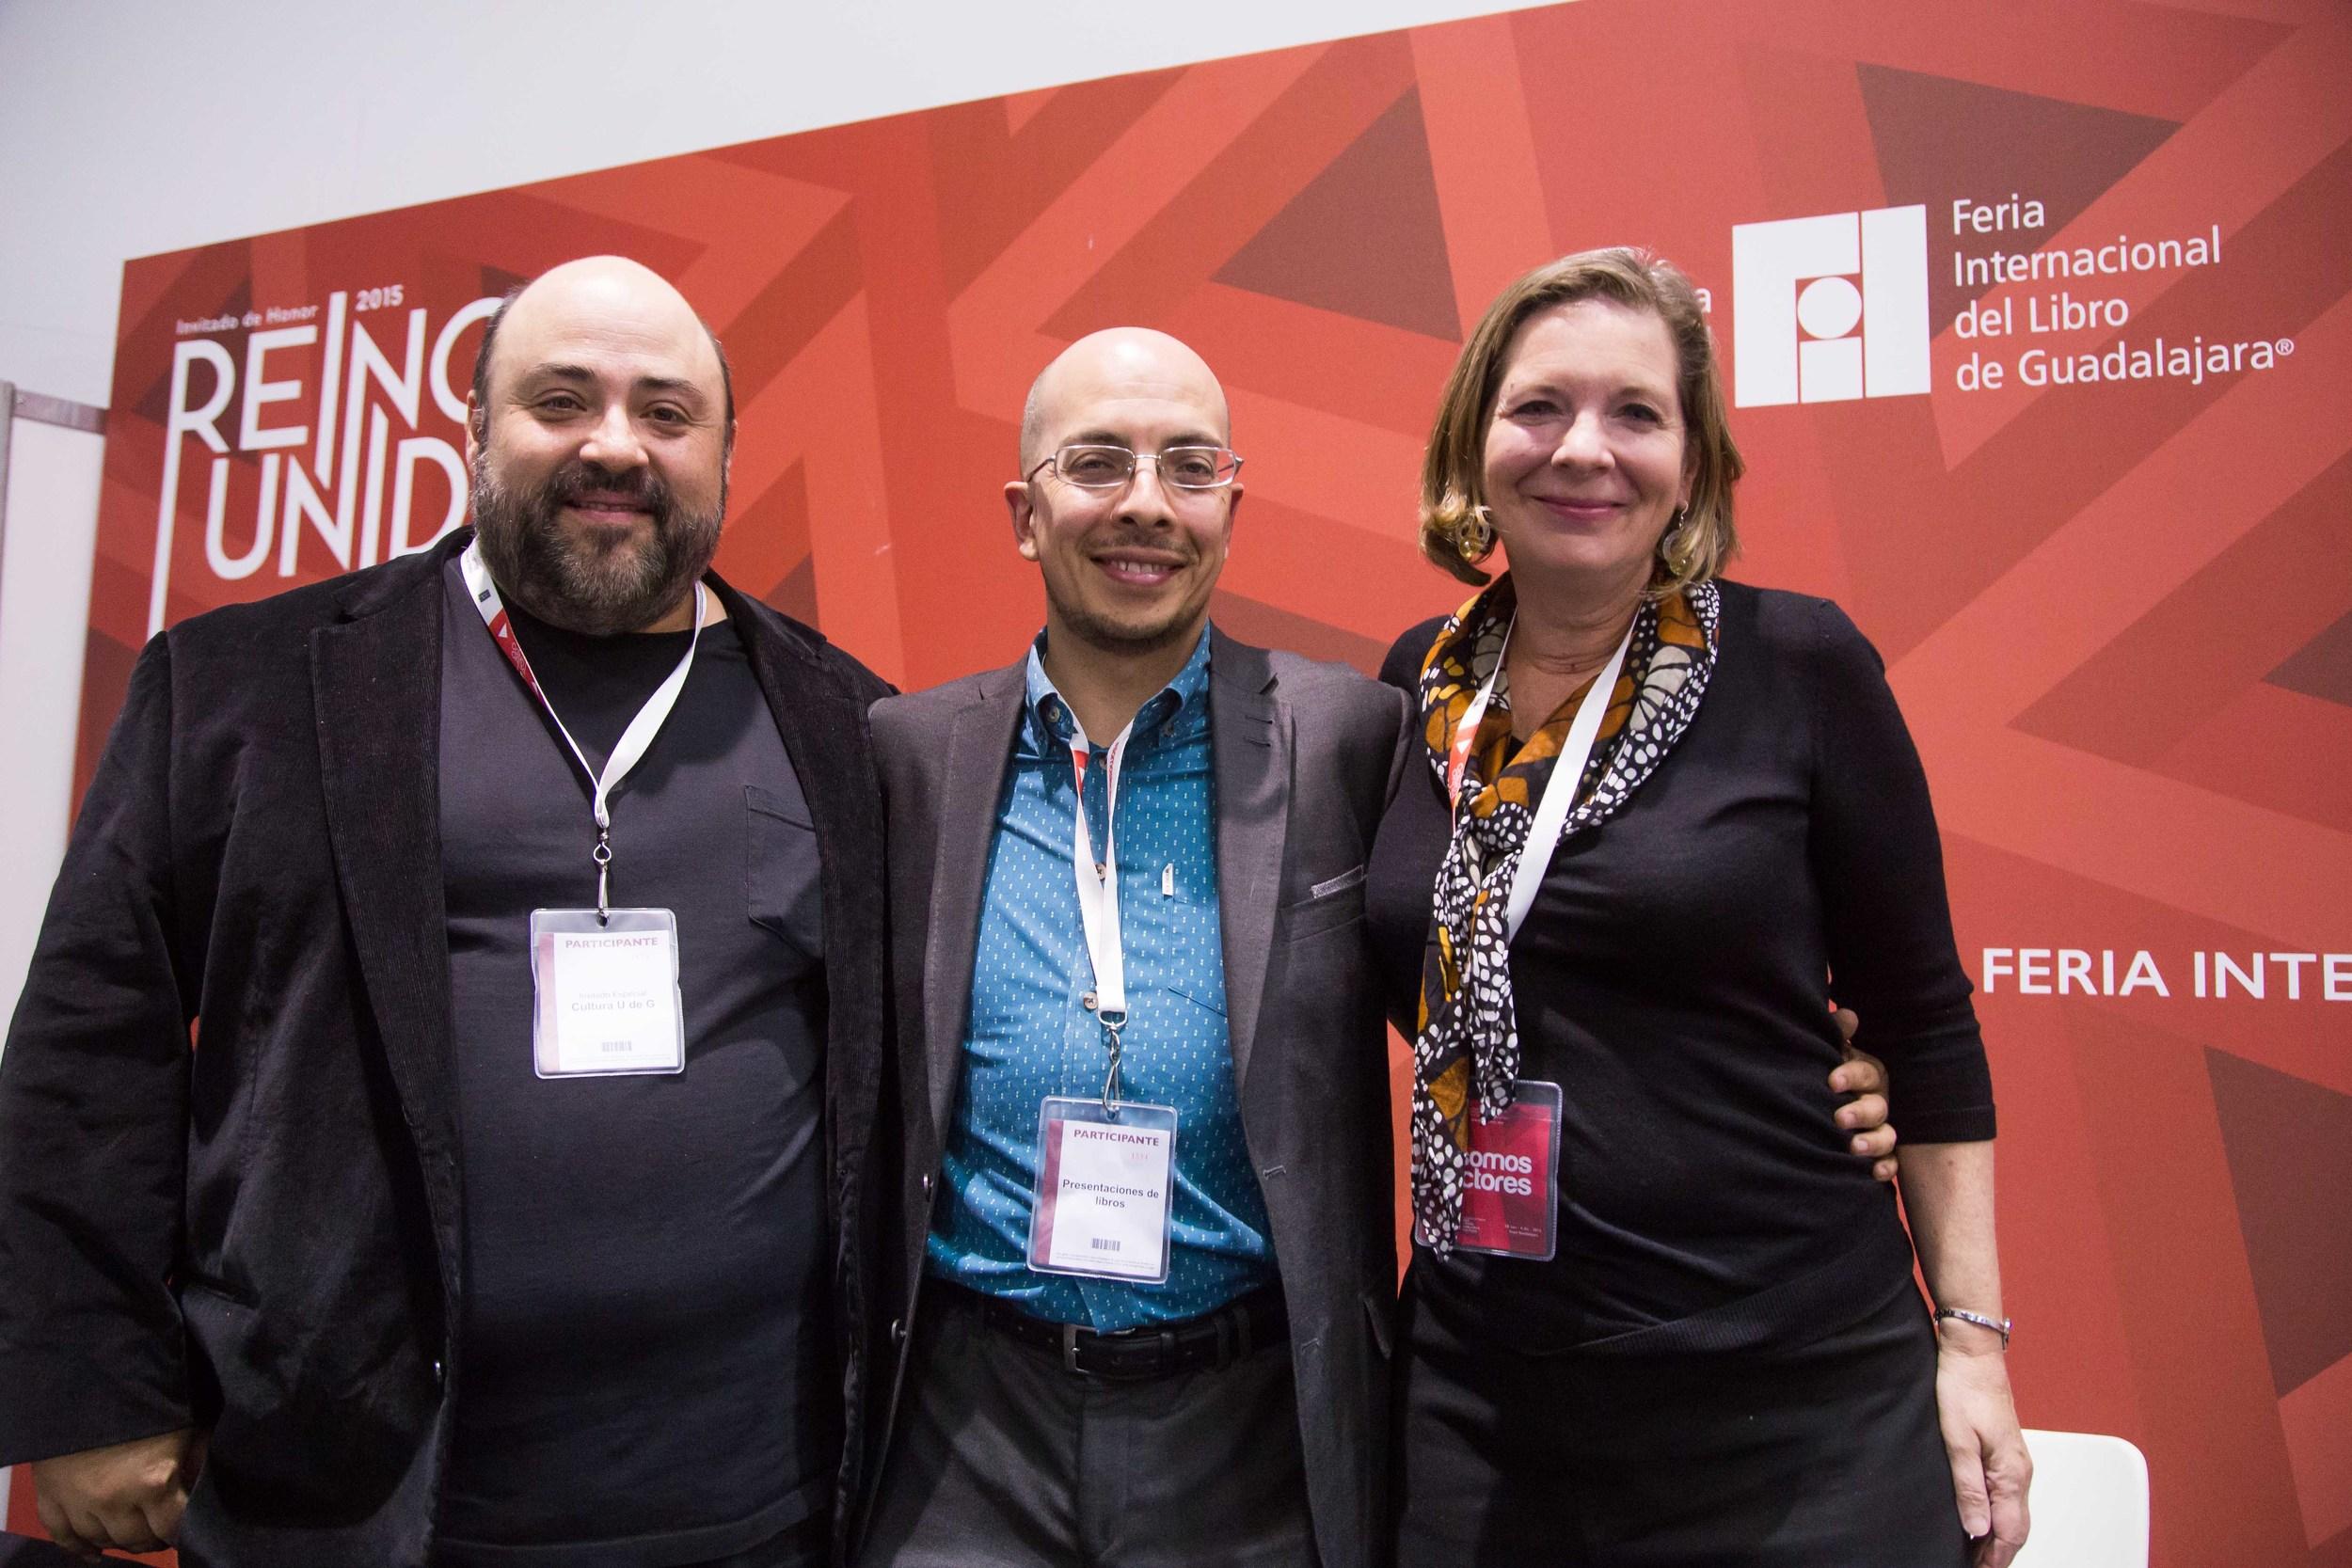 Pablo Gomez, Jorge Volpi and Susan Narucki